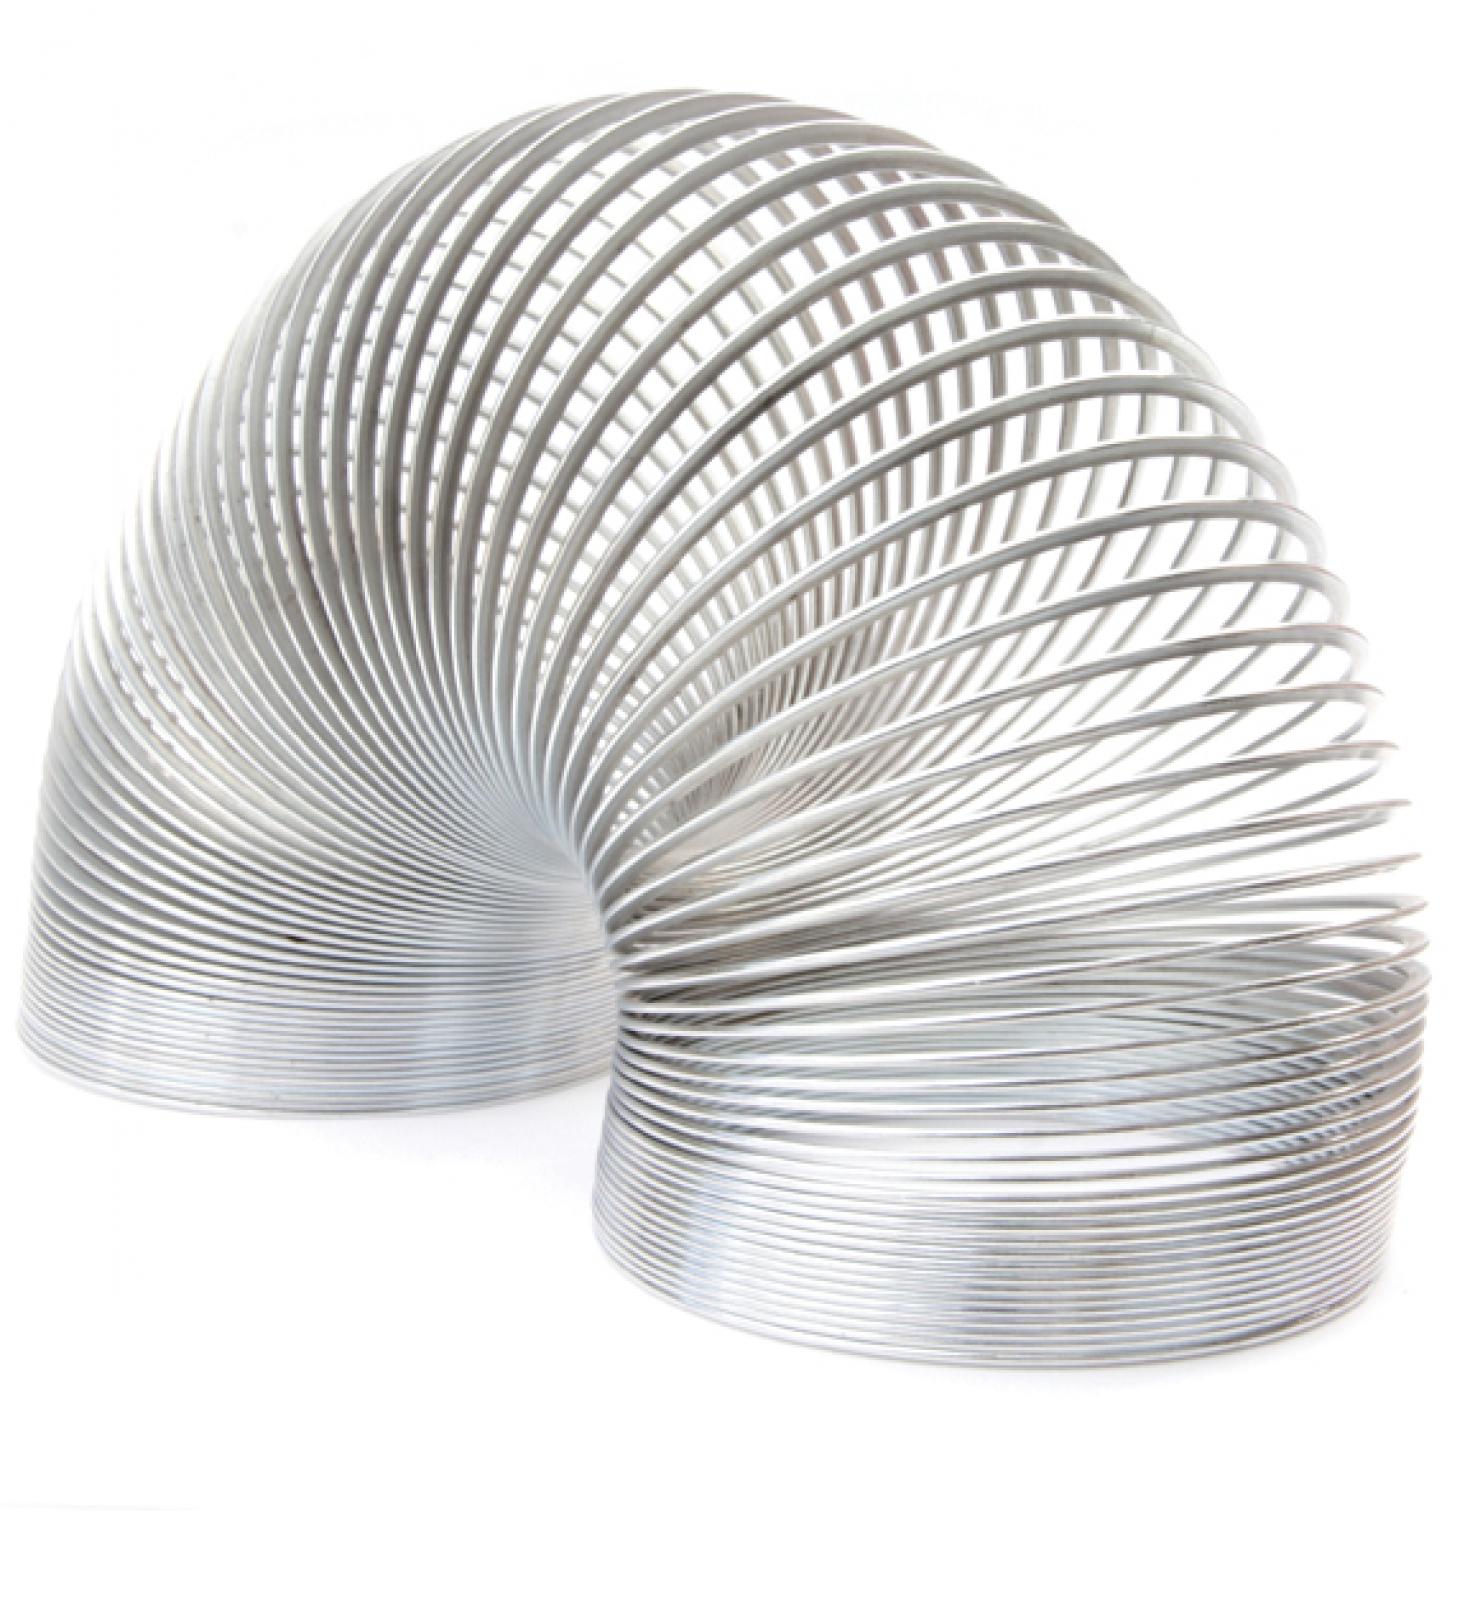 Mini Slinky Metal Springy Toy 3cm